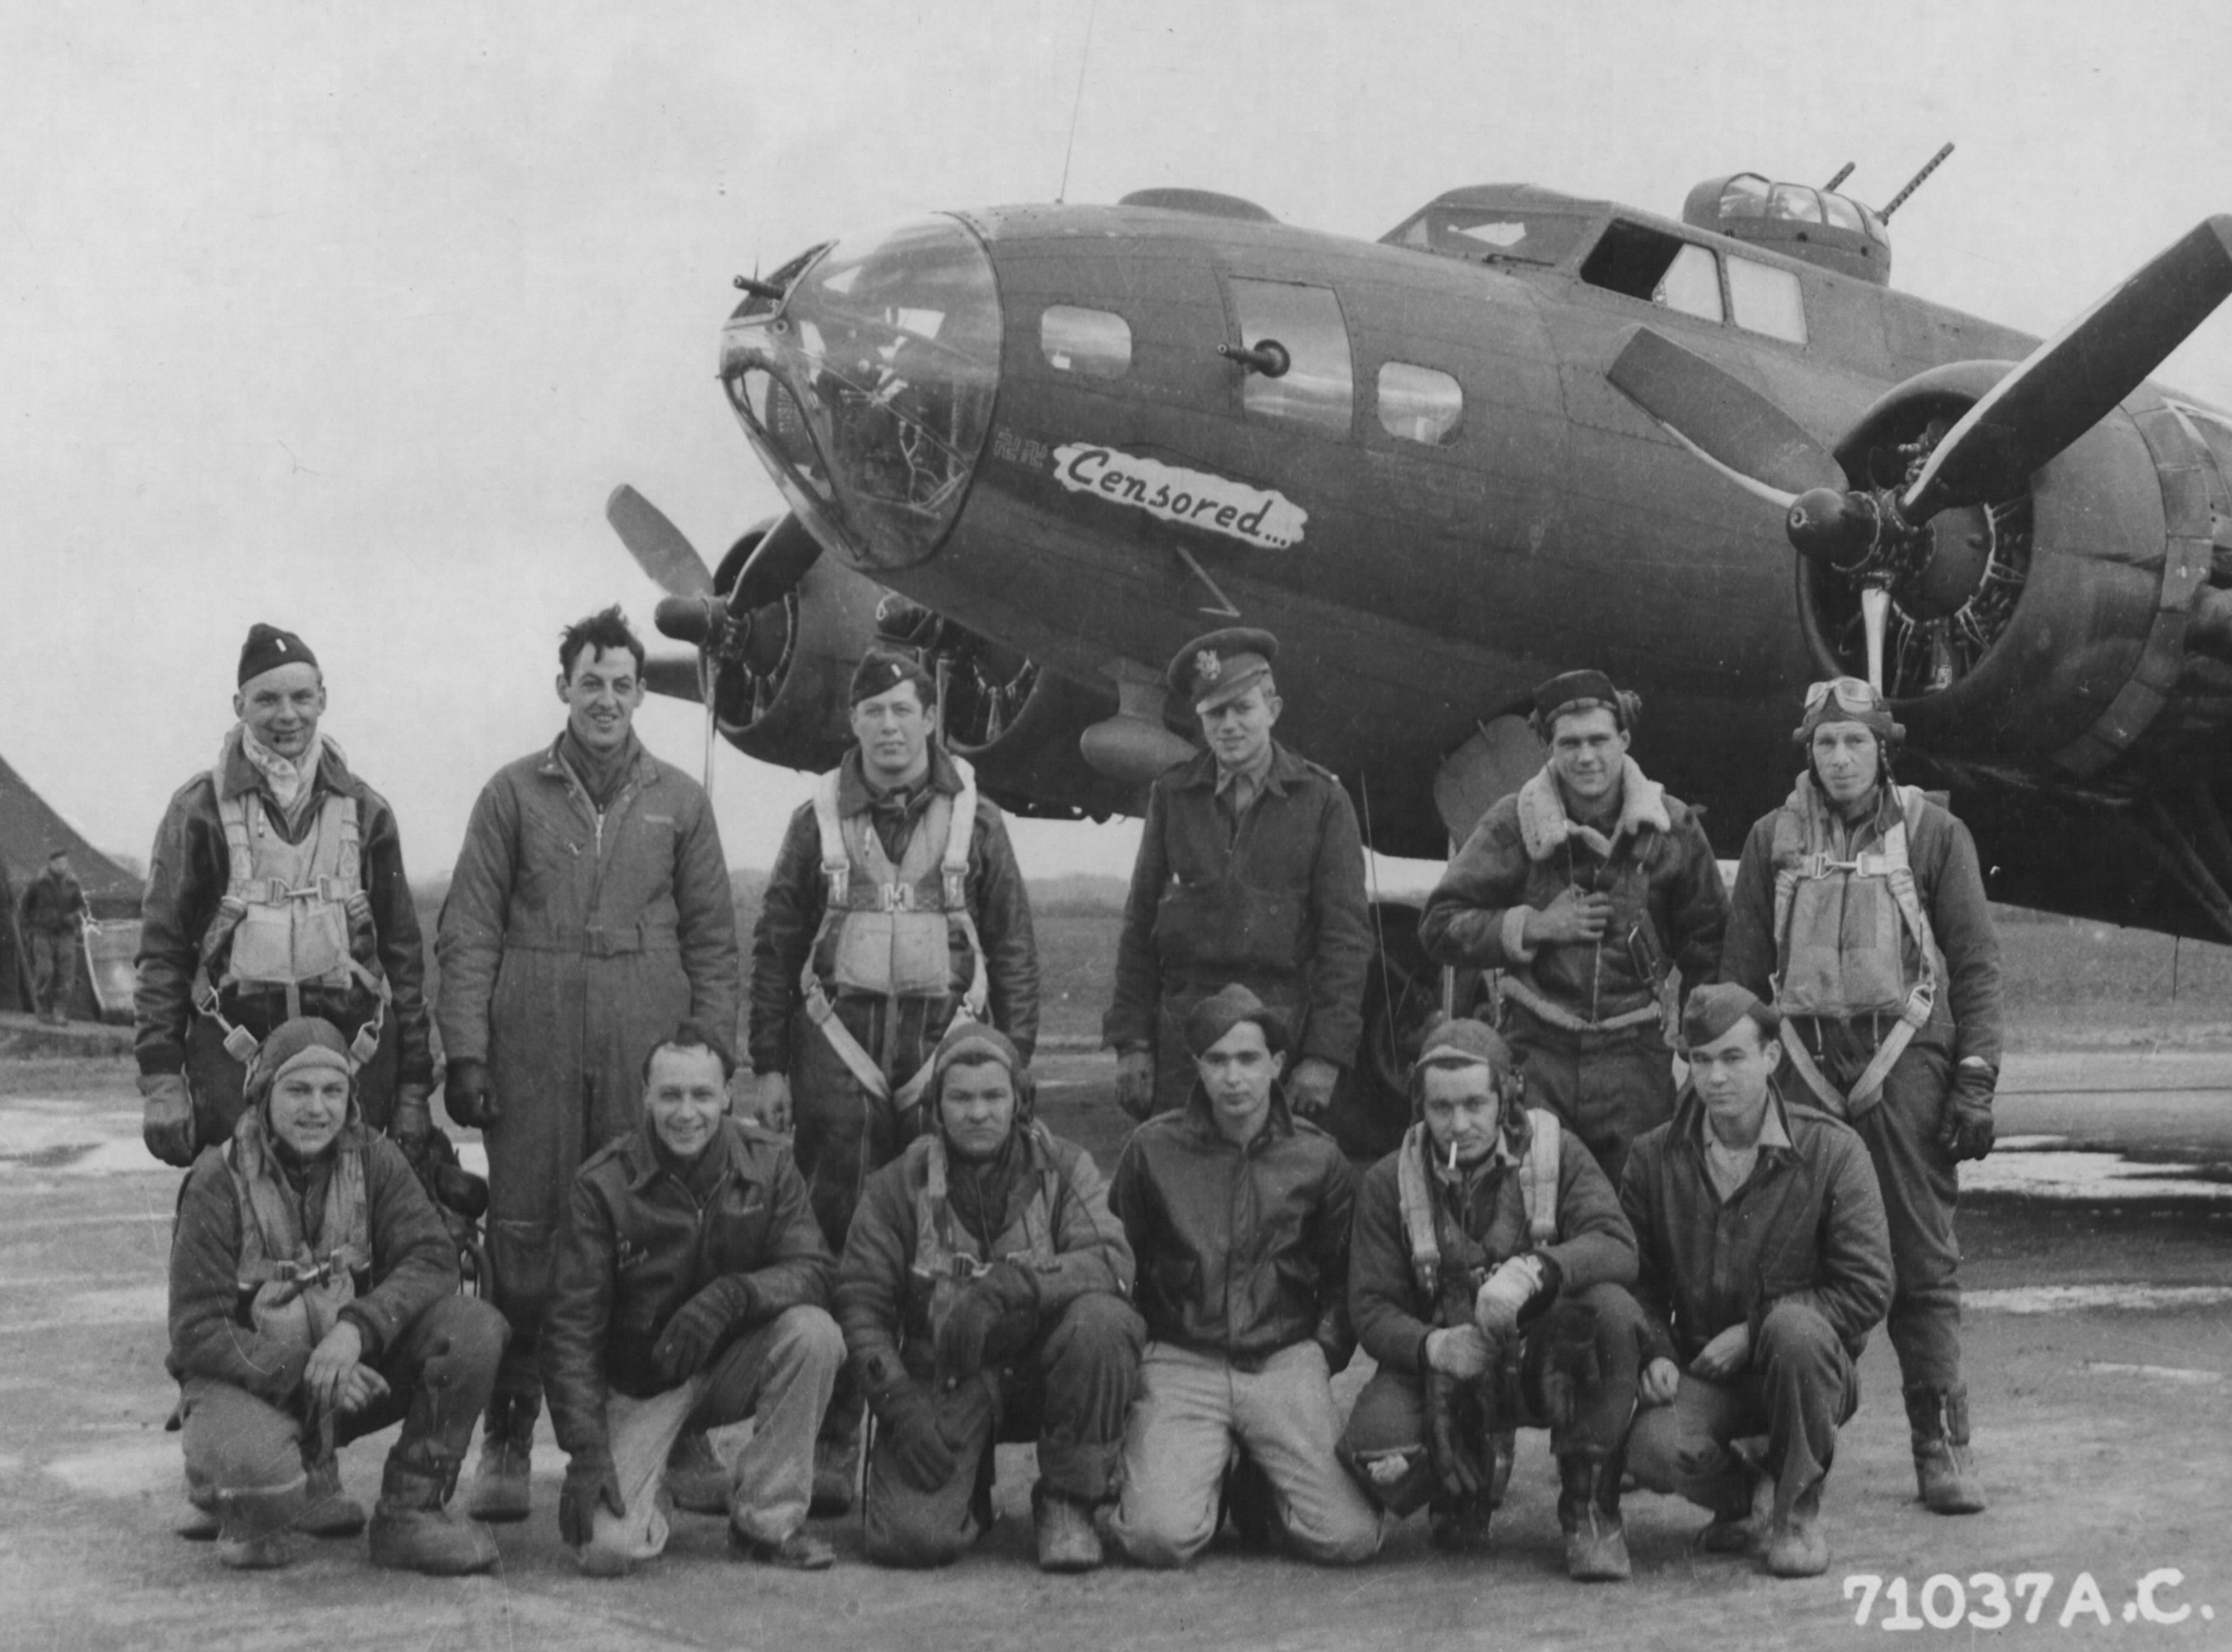 B-17 #42-29897 / Censored aka Forequetoo